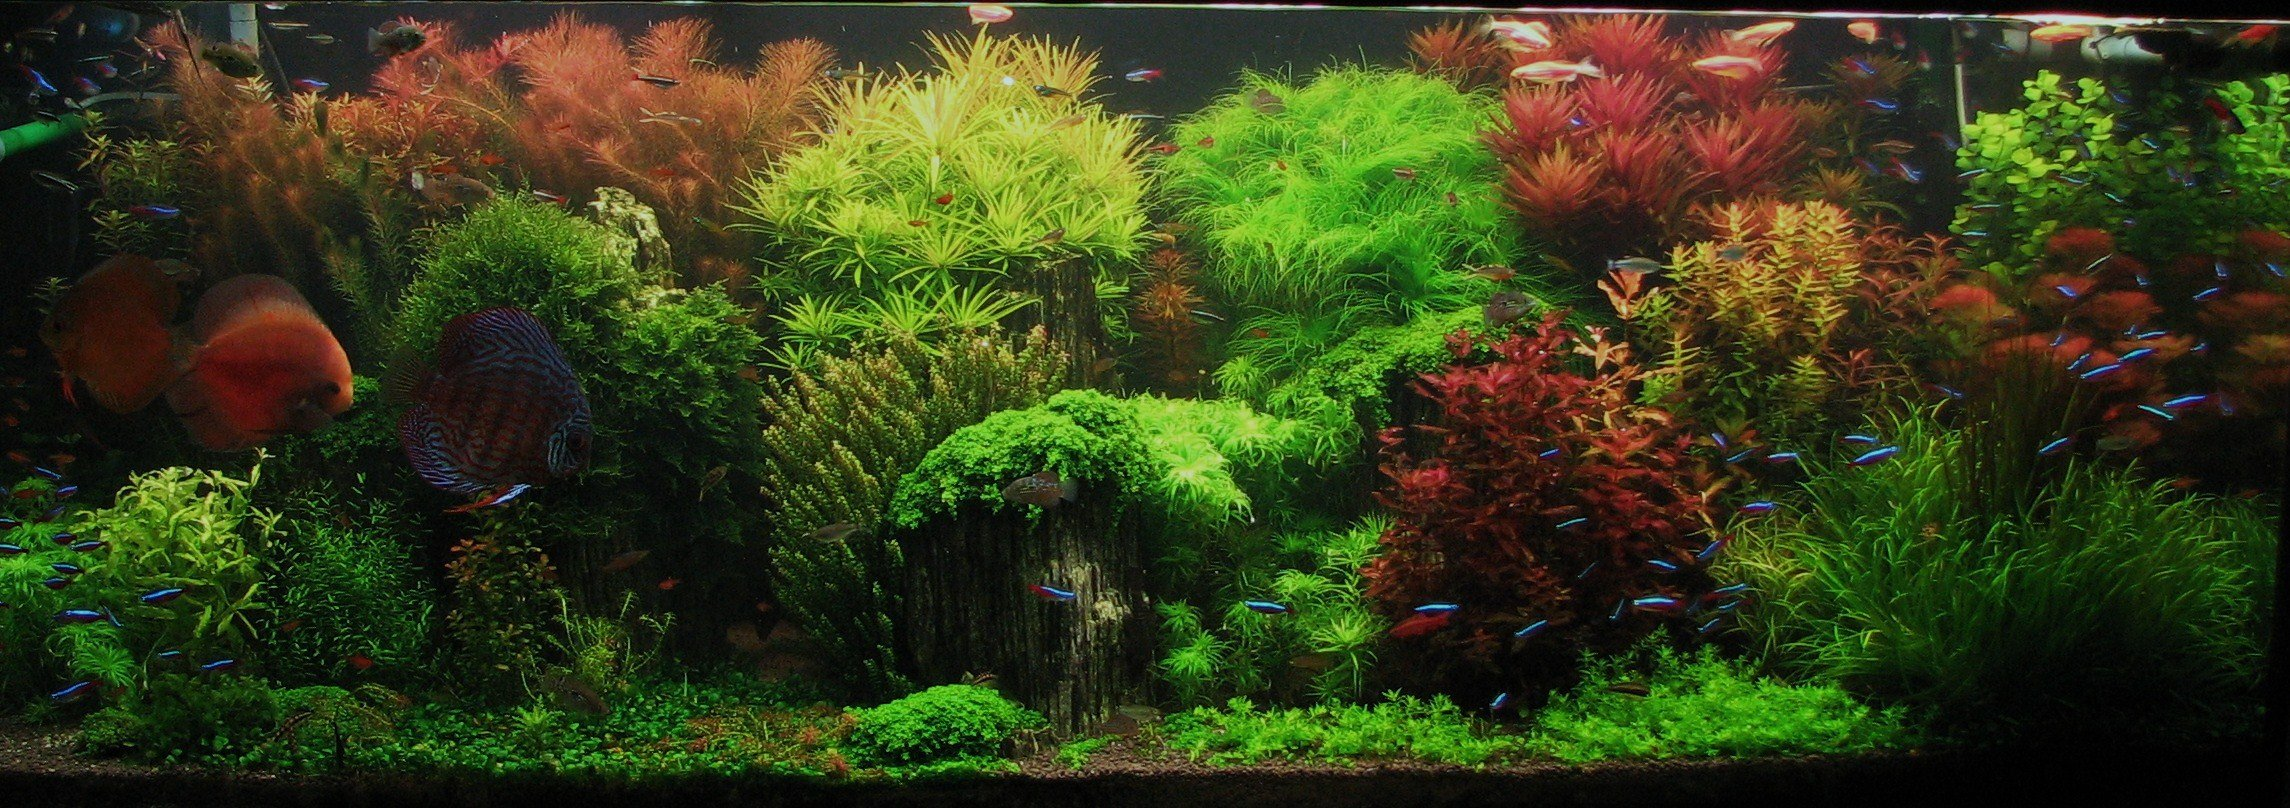 Top 5 Modern Aquascaping Designs For Your Freshwater Fish Aquarium Aquariumstoredepot